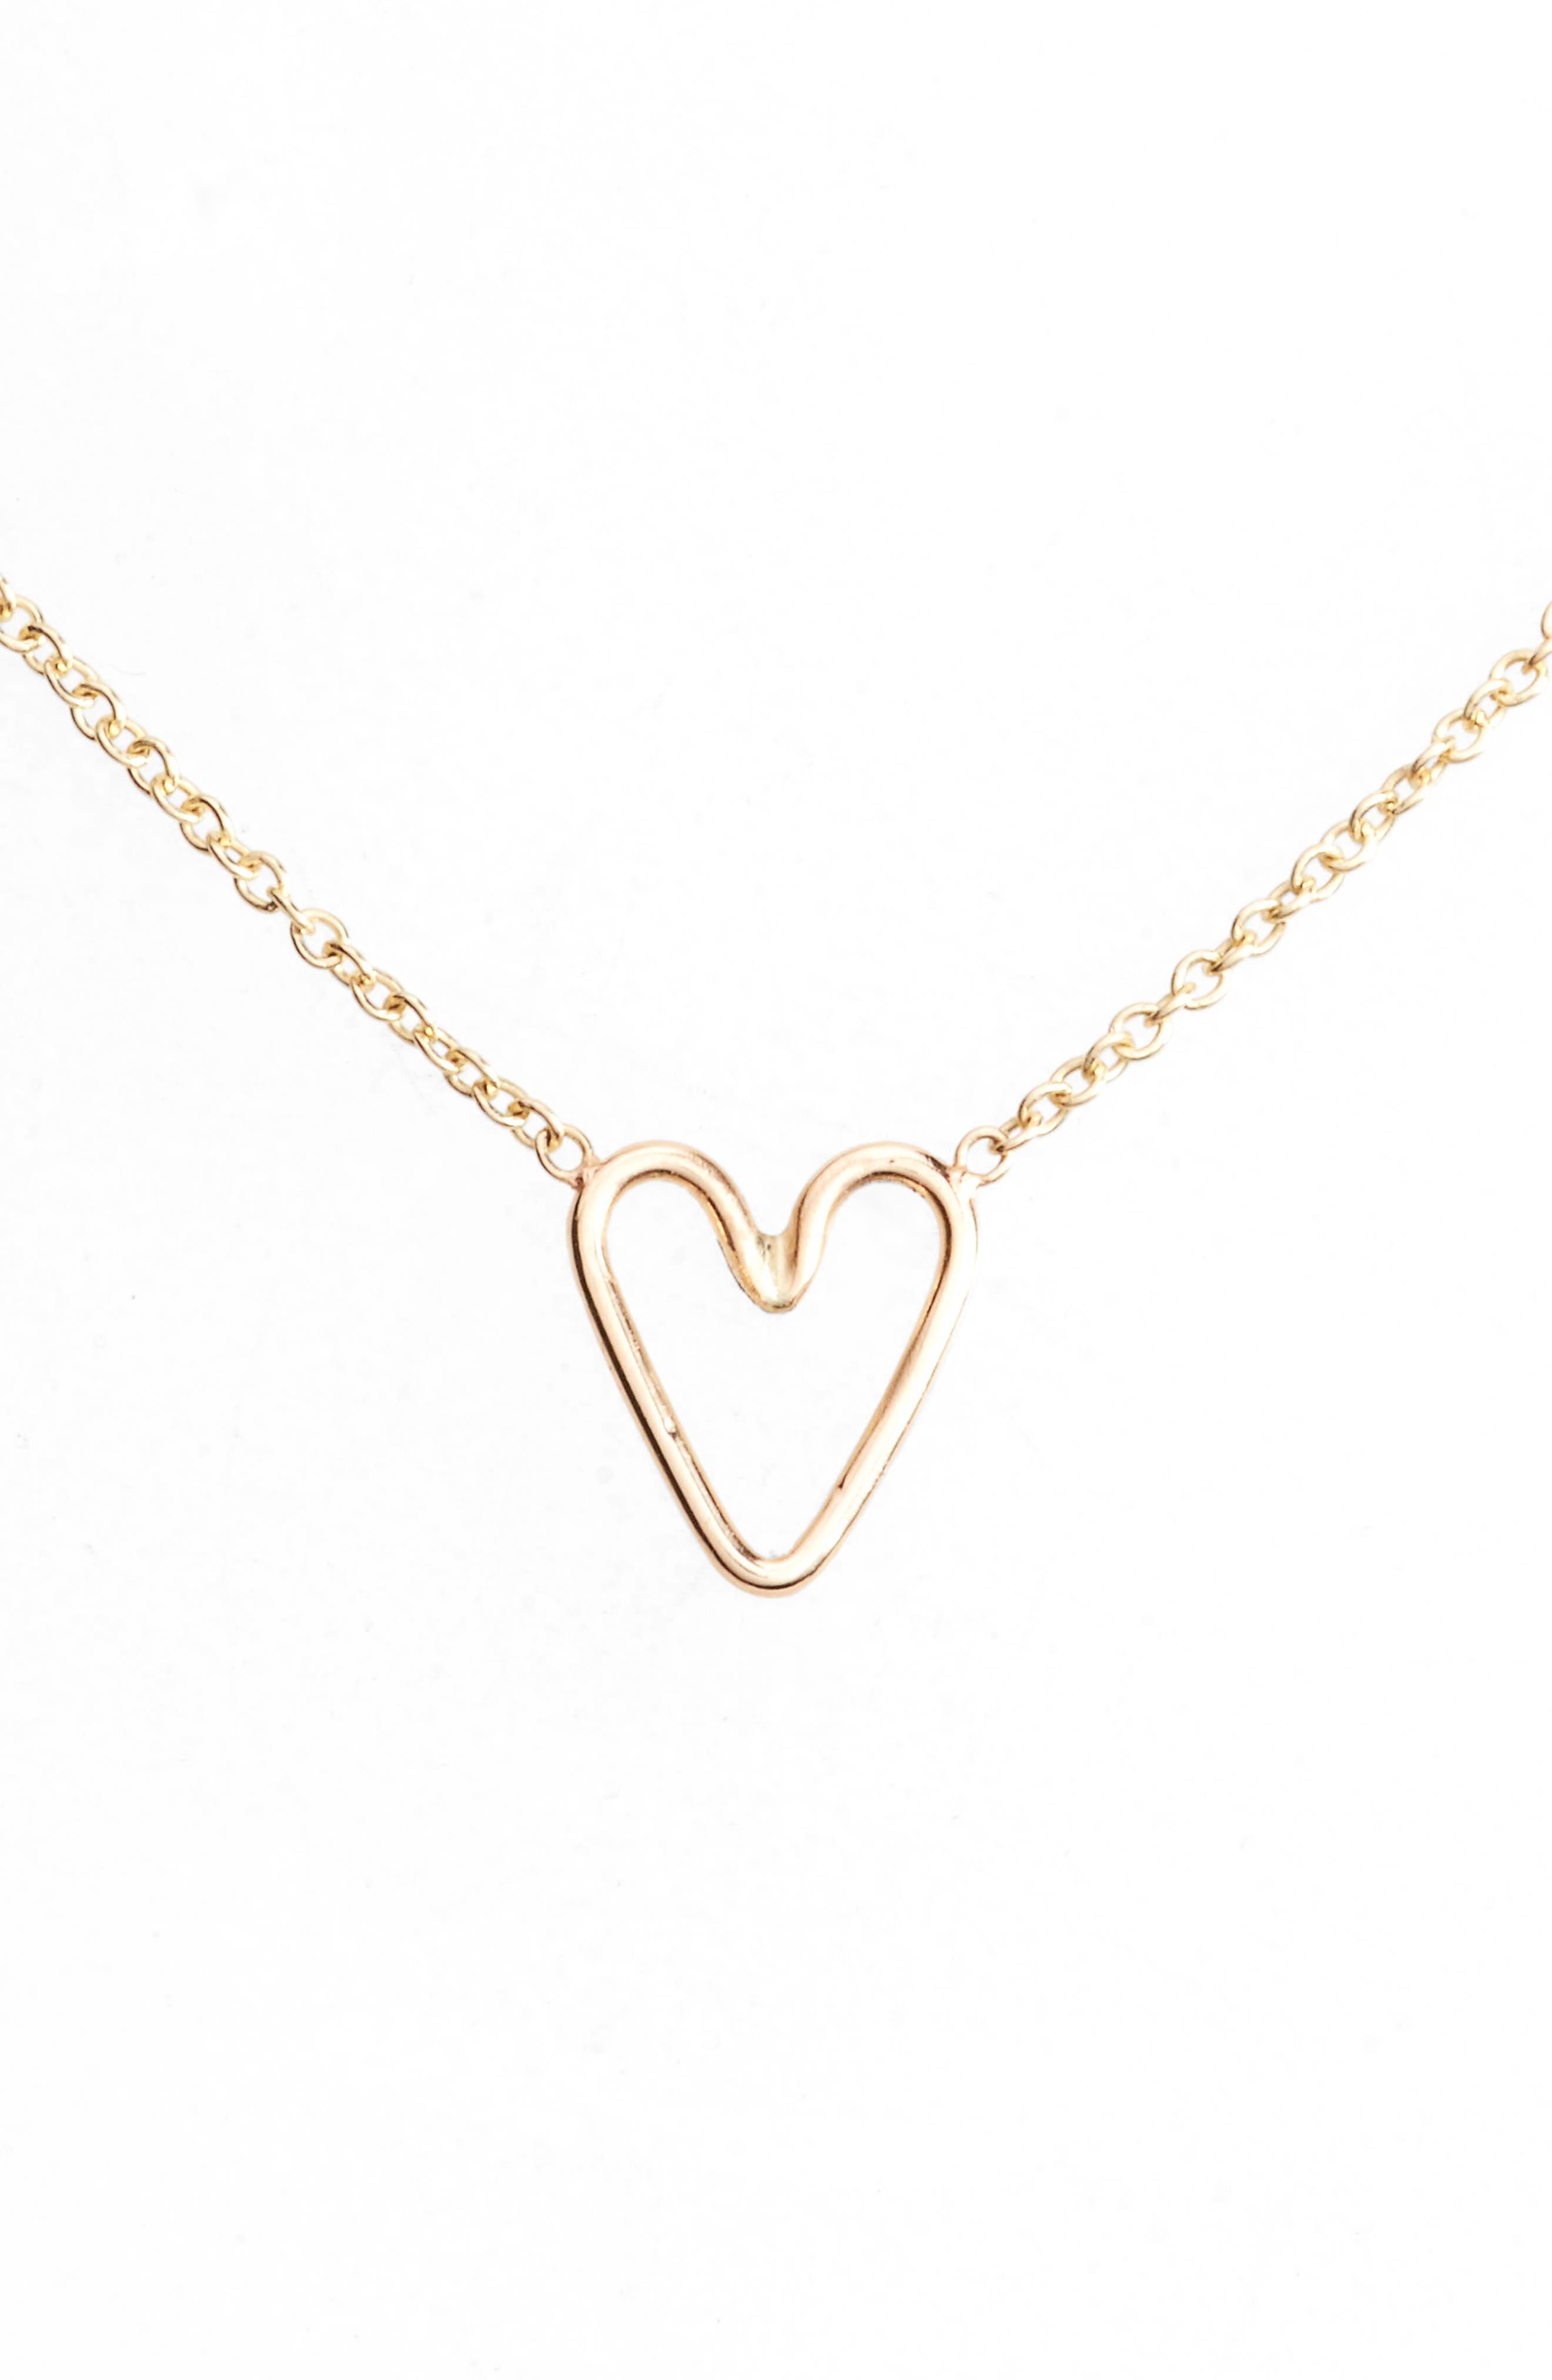 Alternate Image 1 Selected - Zoë Chicco Tiny Open Heart Pendant Necklace